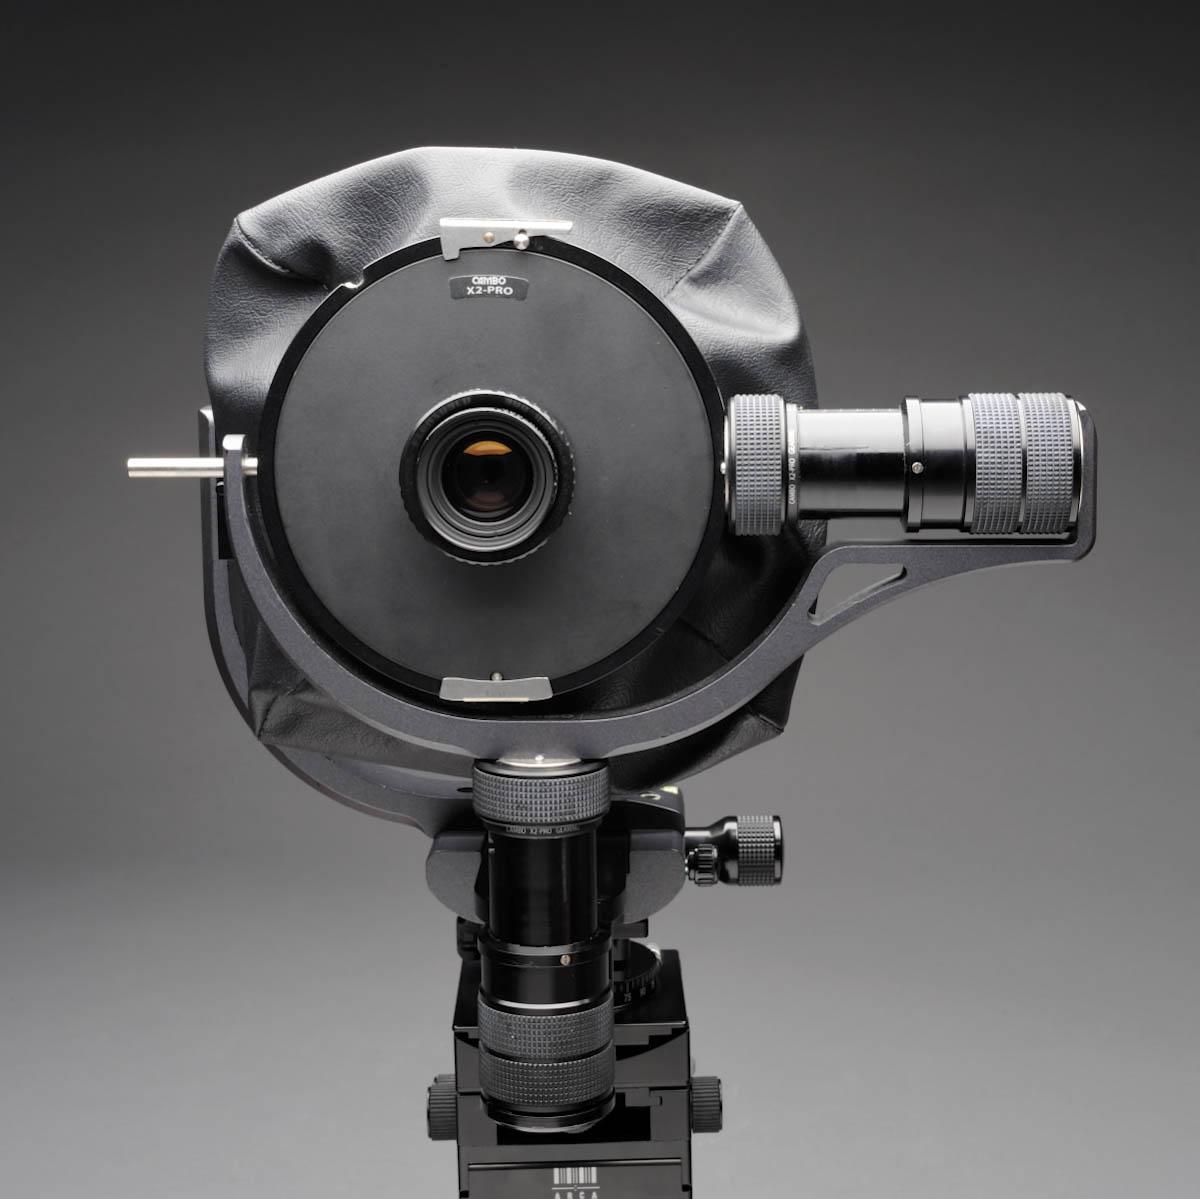 Nikon-D800-Cambo-X2-Pro-Schneider-Kreuznach-APO-90mm-f4.5-8